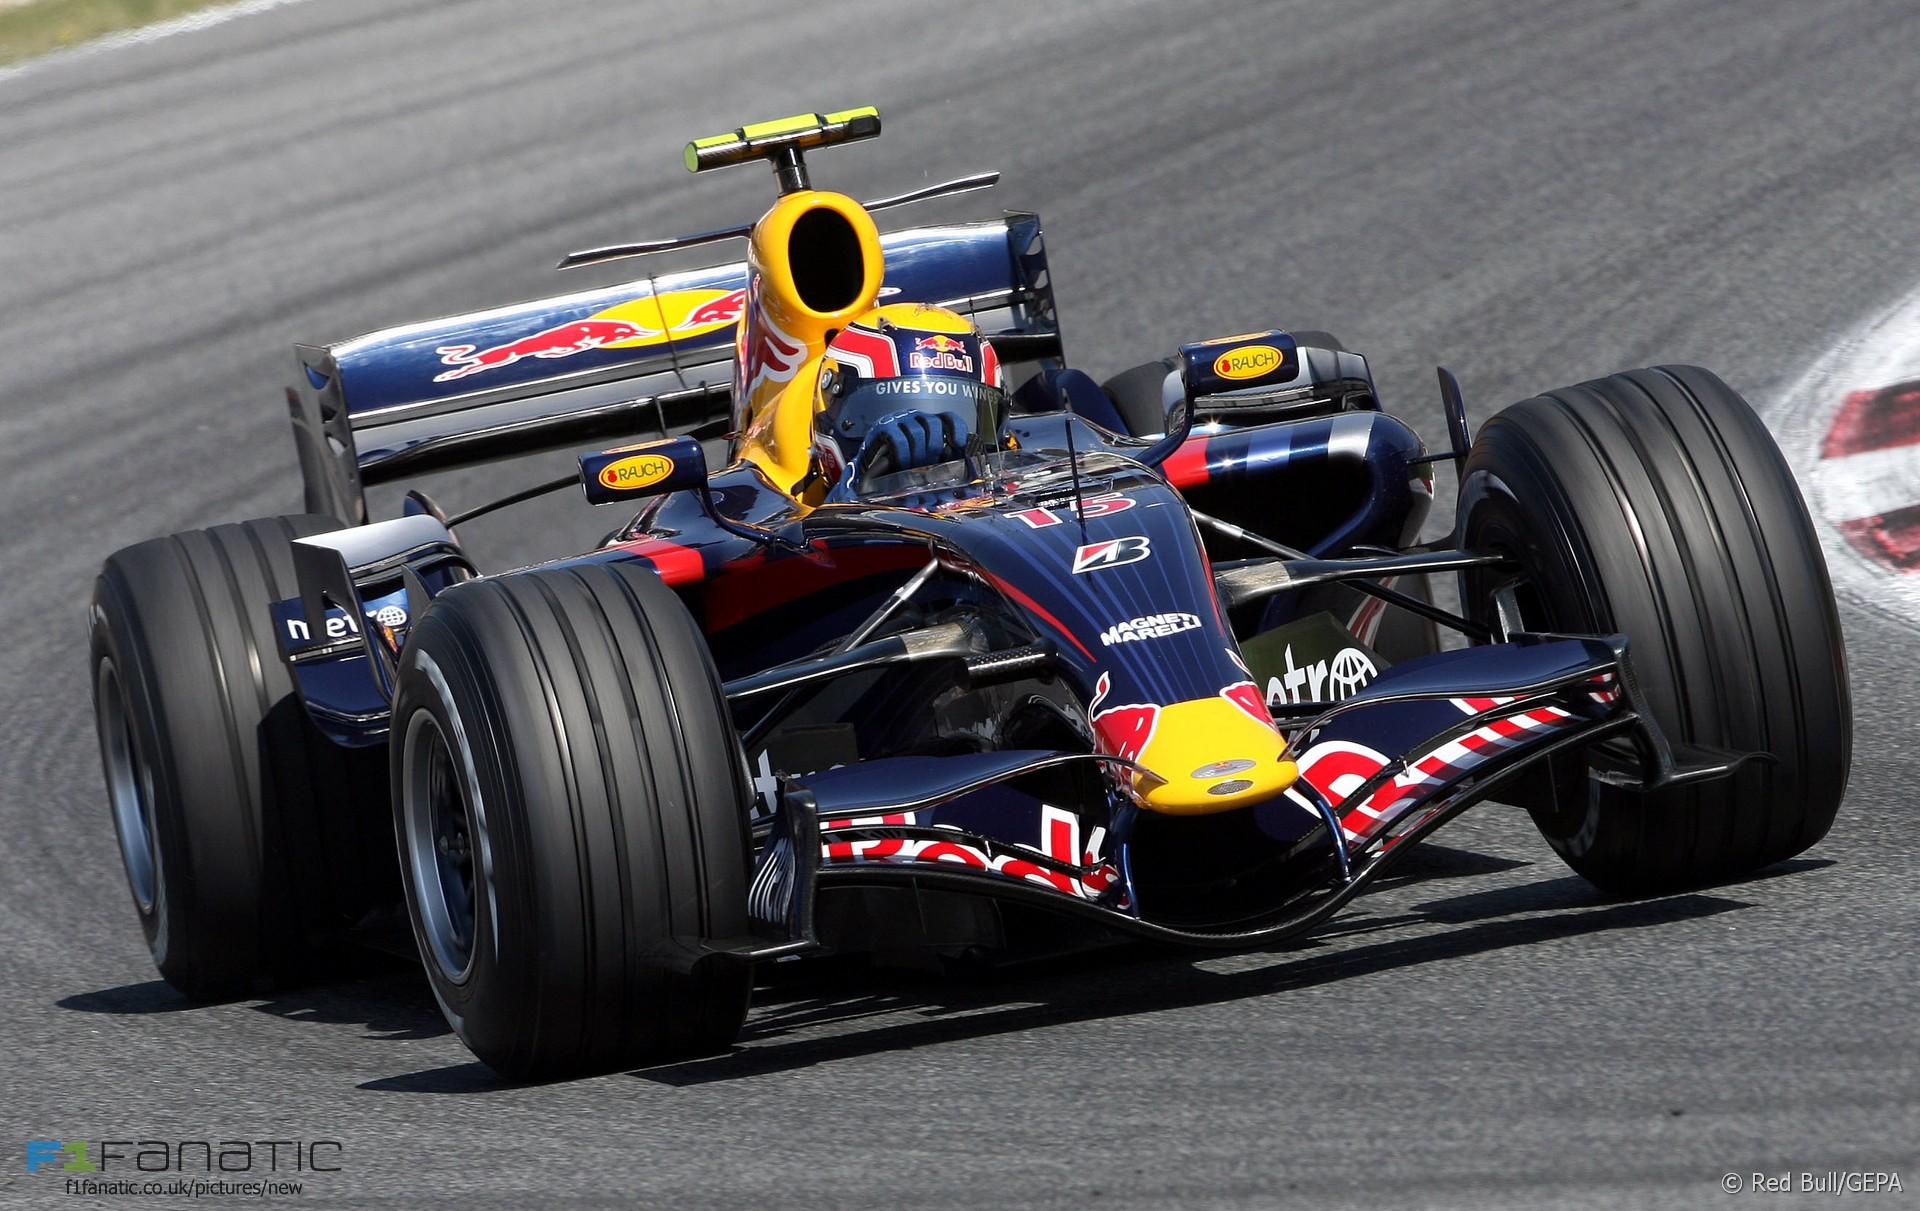 Mark Webber, Red Bull, Circuit de Catalunya, Barcelona, 2007